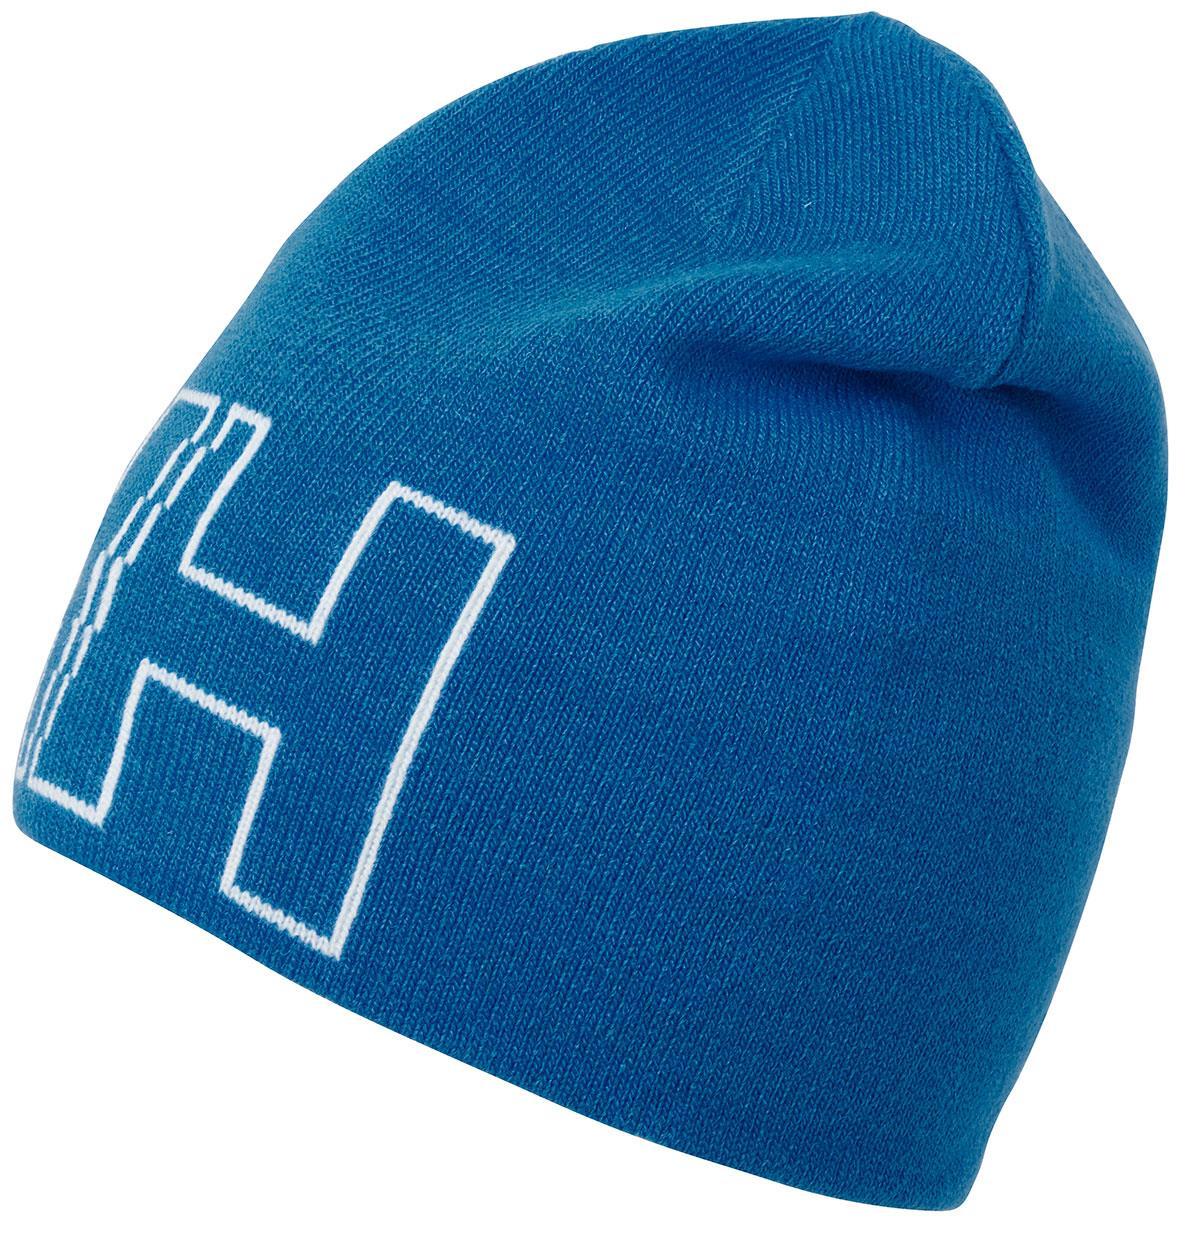 Helly Hansen HH OUTLINE Bere